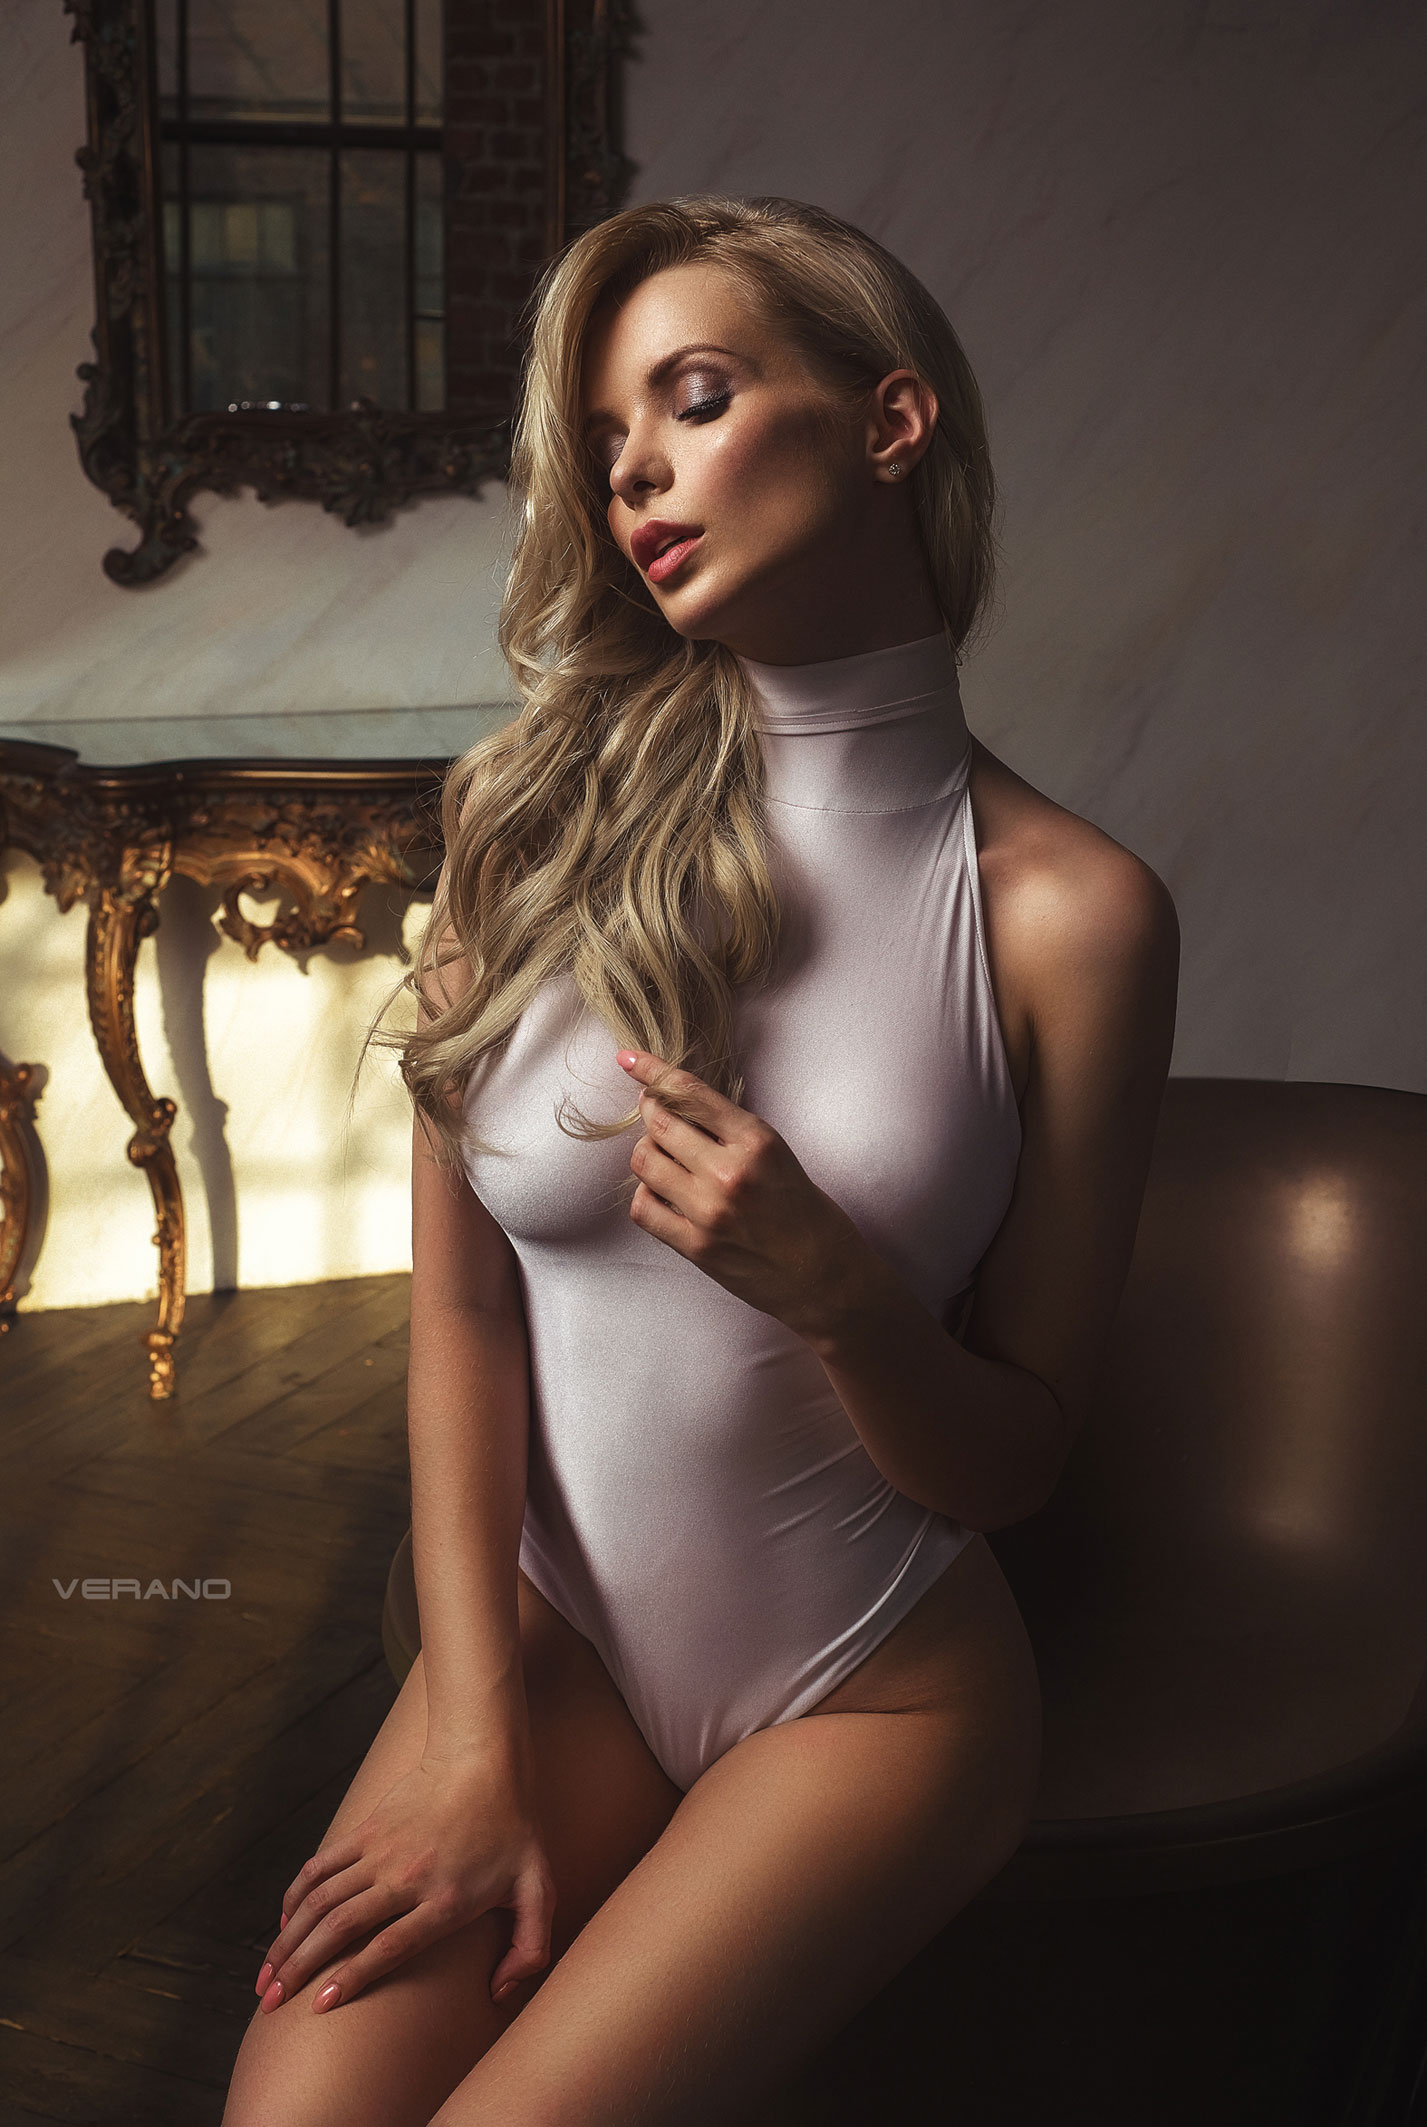 Екатерина Енокаева / Ekaterina Enokaeva by Nikolas Verano